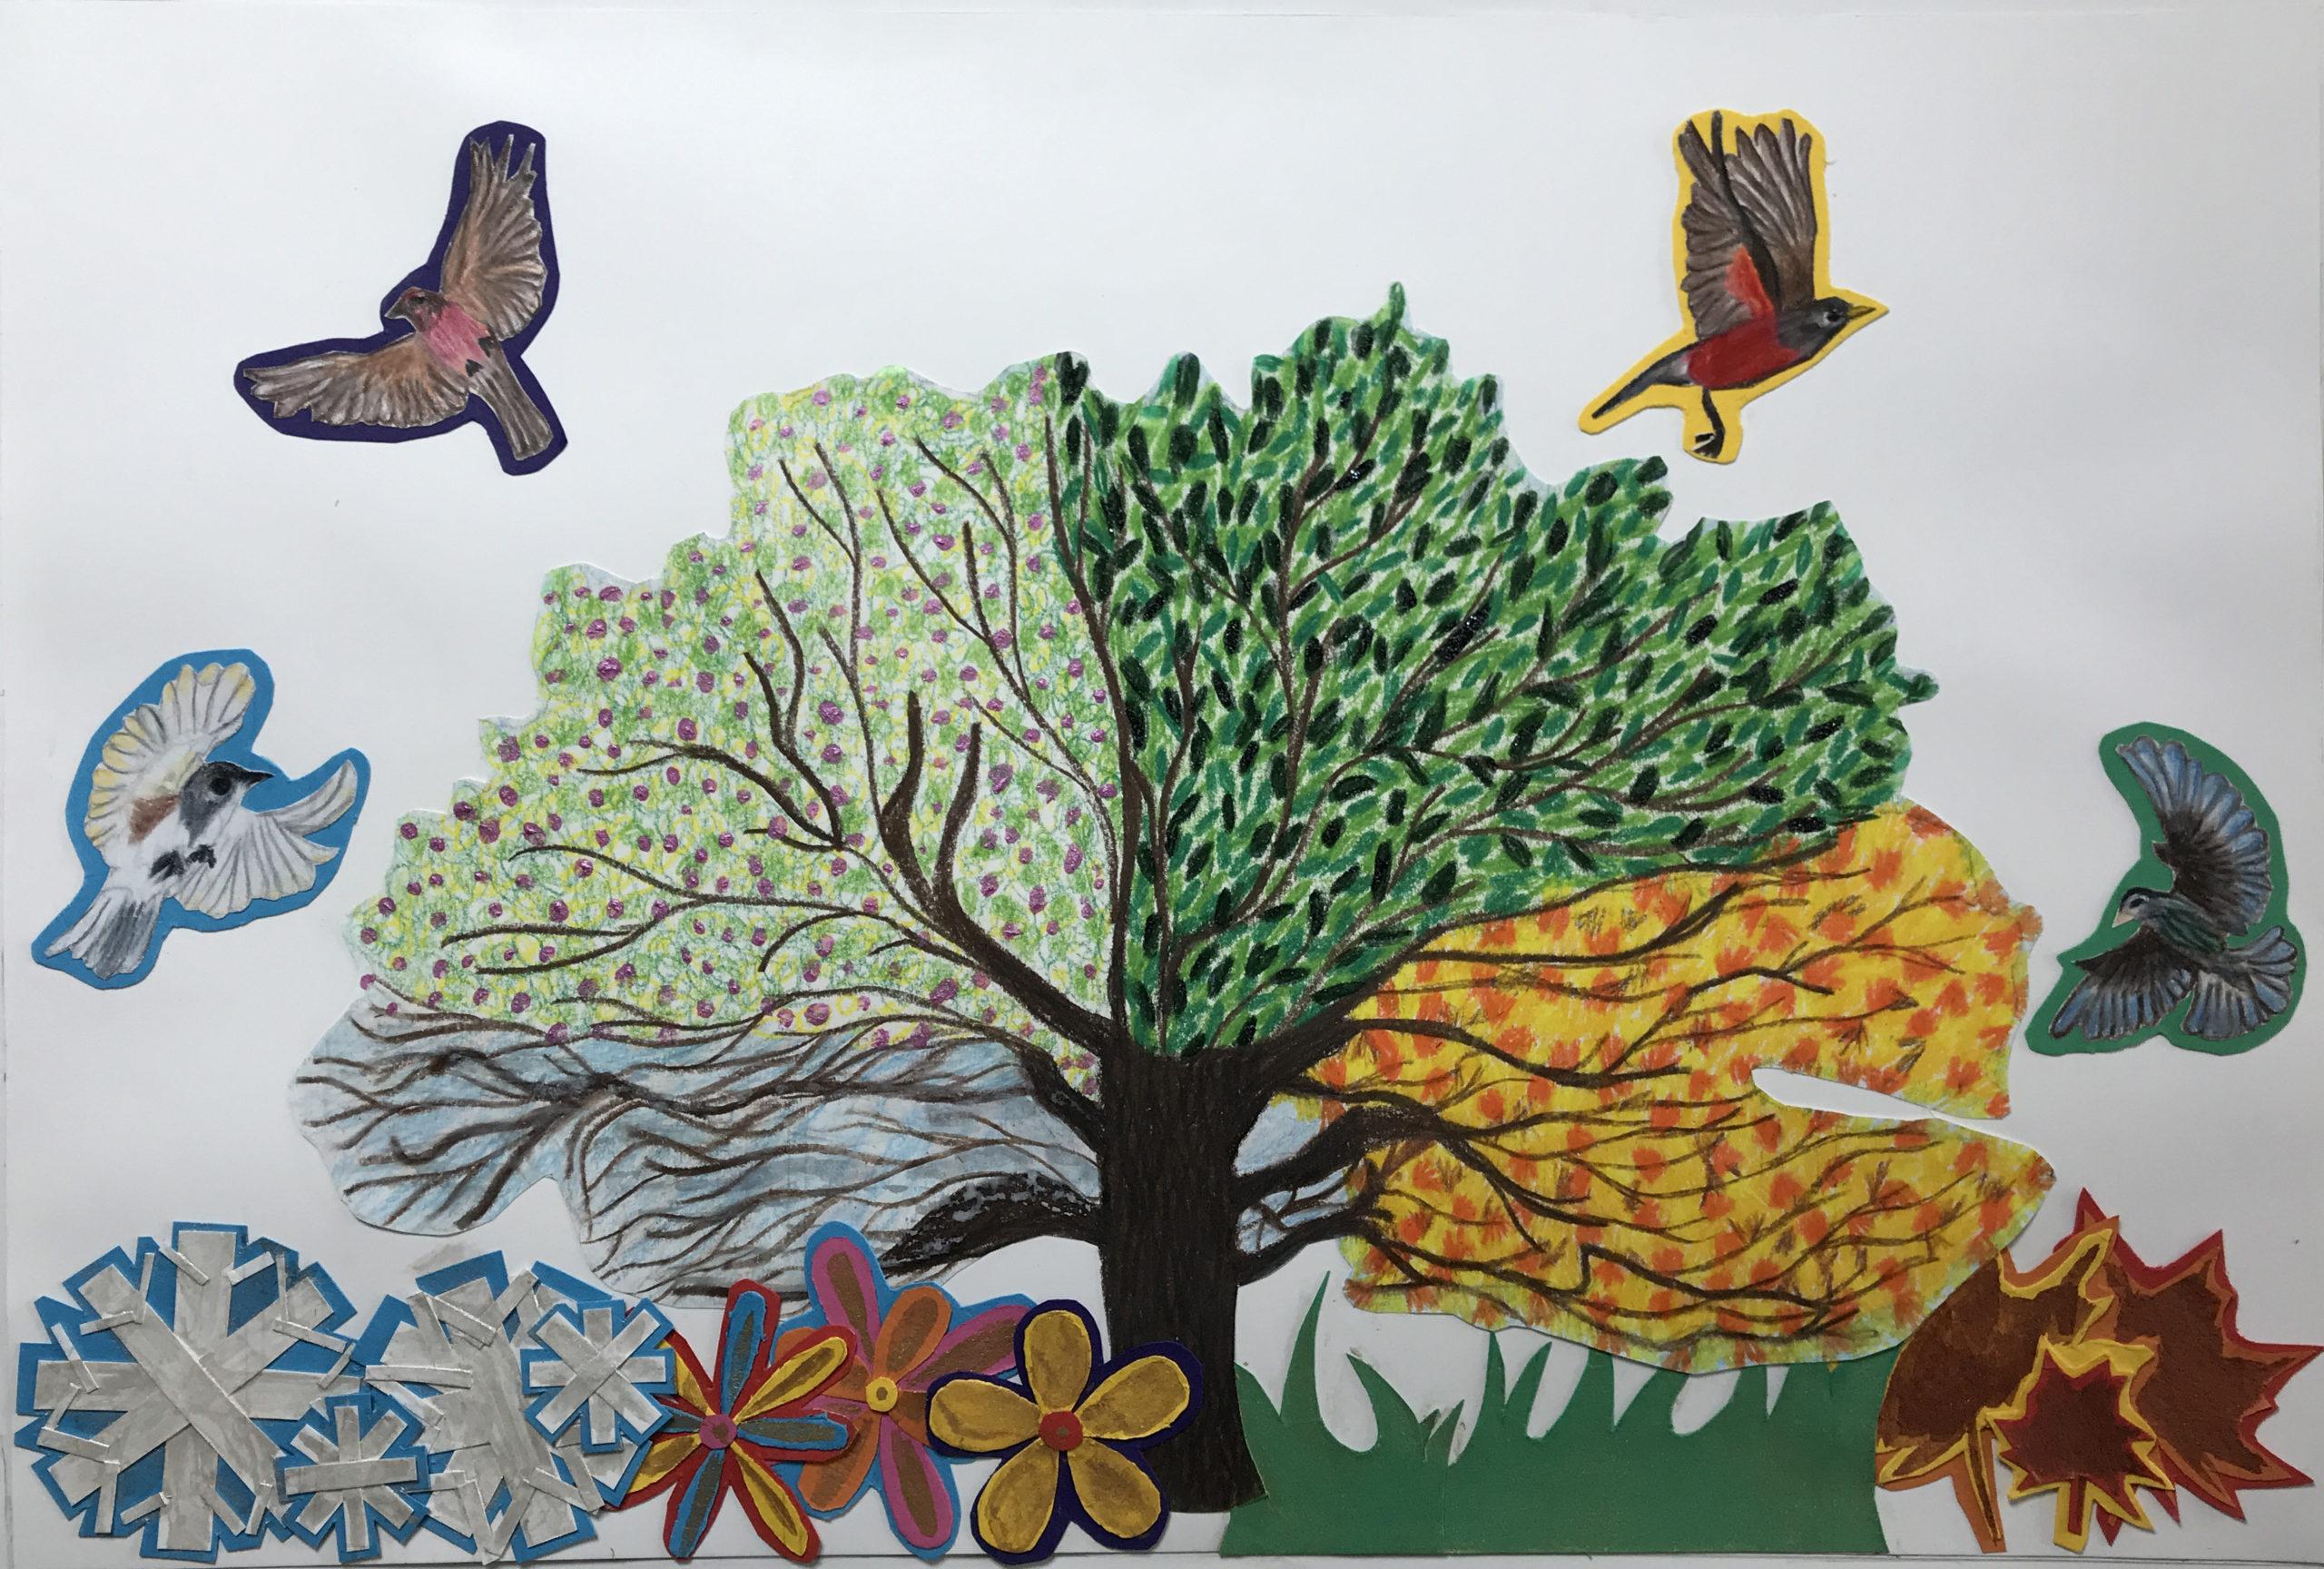 Vivaldi Four Seasons student artwork from MassArt, Ivana Levy